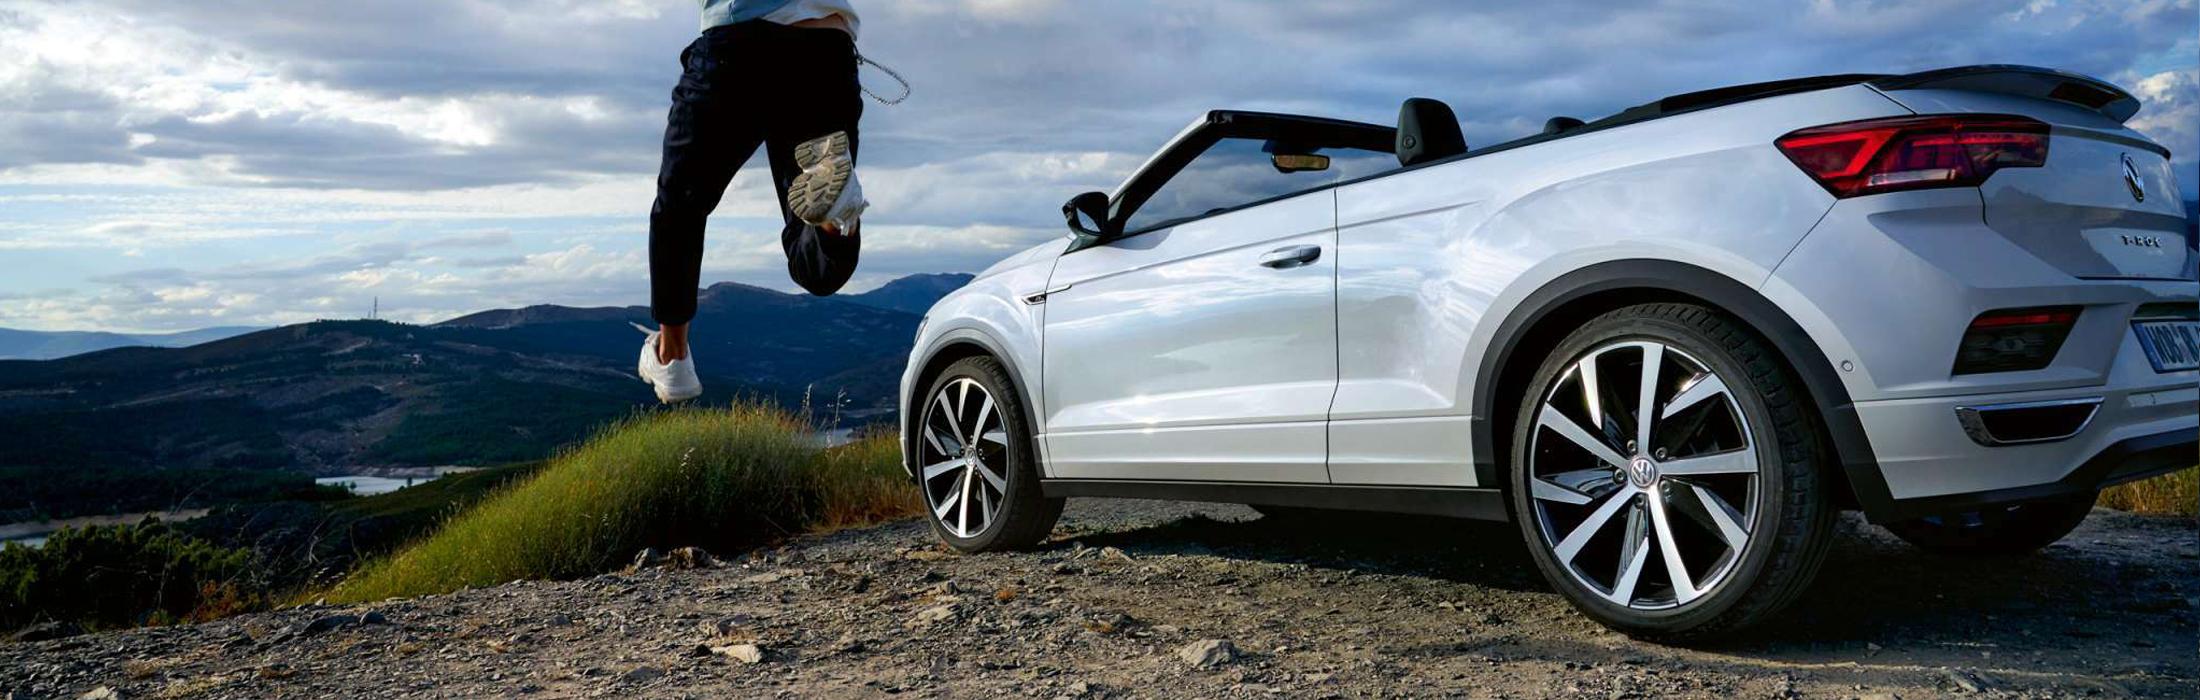 AVP Autoland VW T-Roc Cabriolet